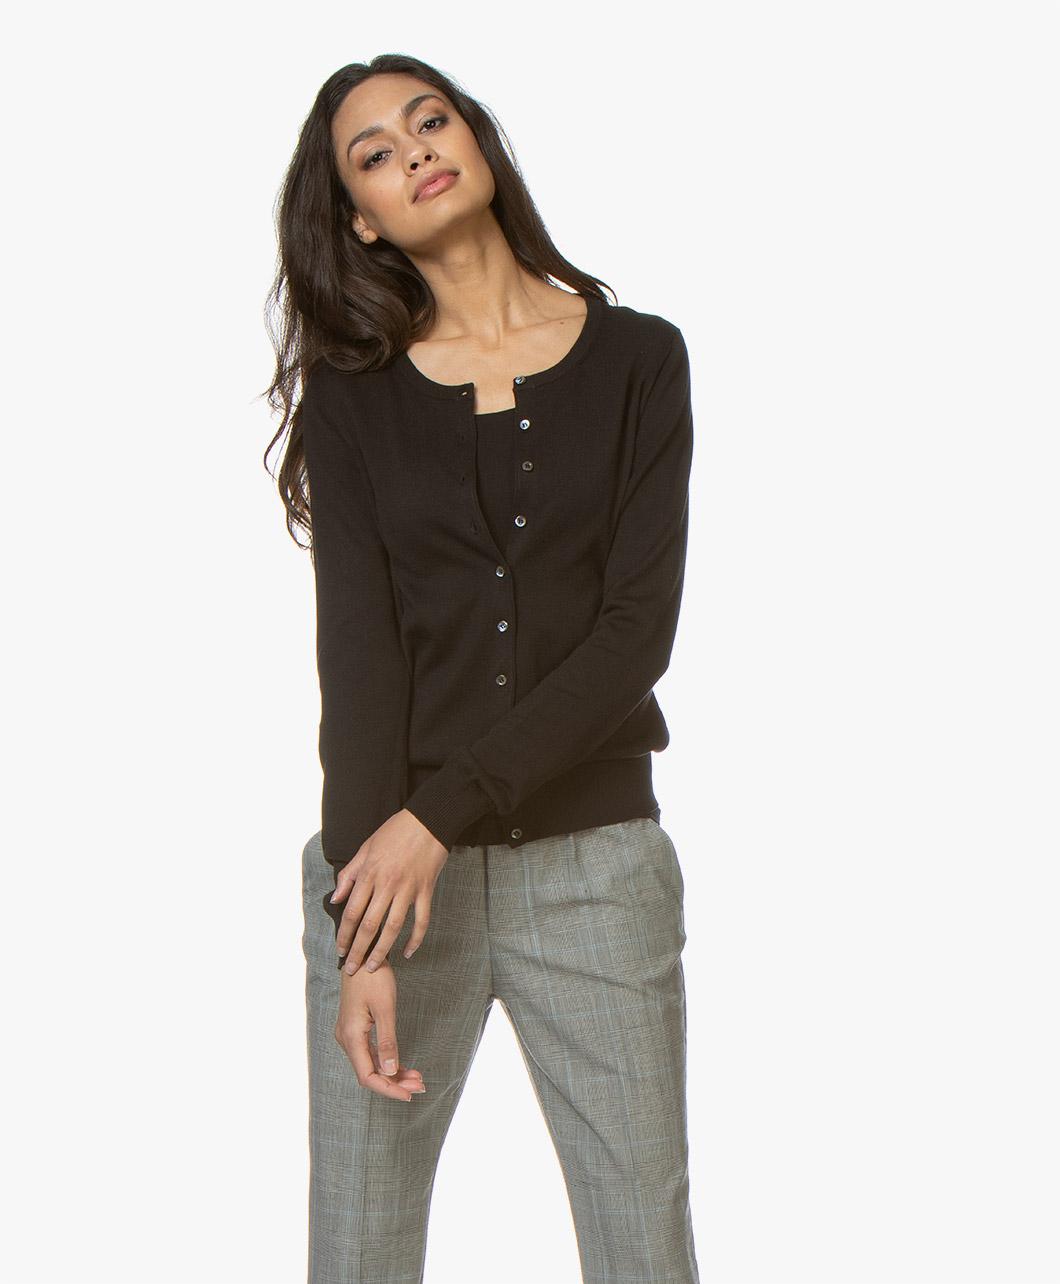 7aba1925b58 Repeat Classic Short Cotton Blend Cardigan - Black - 400053 1025